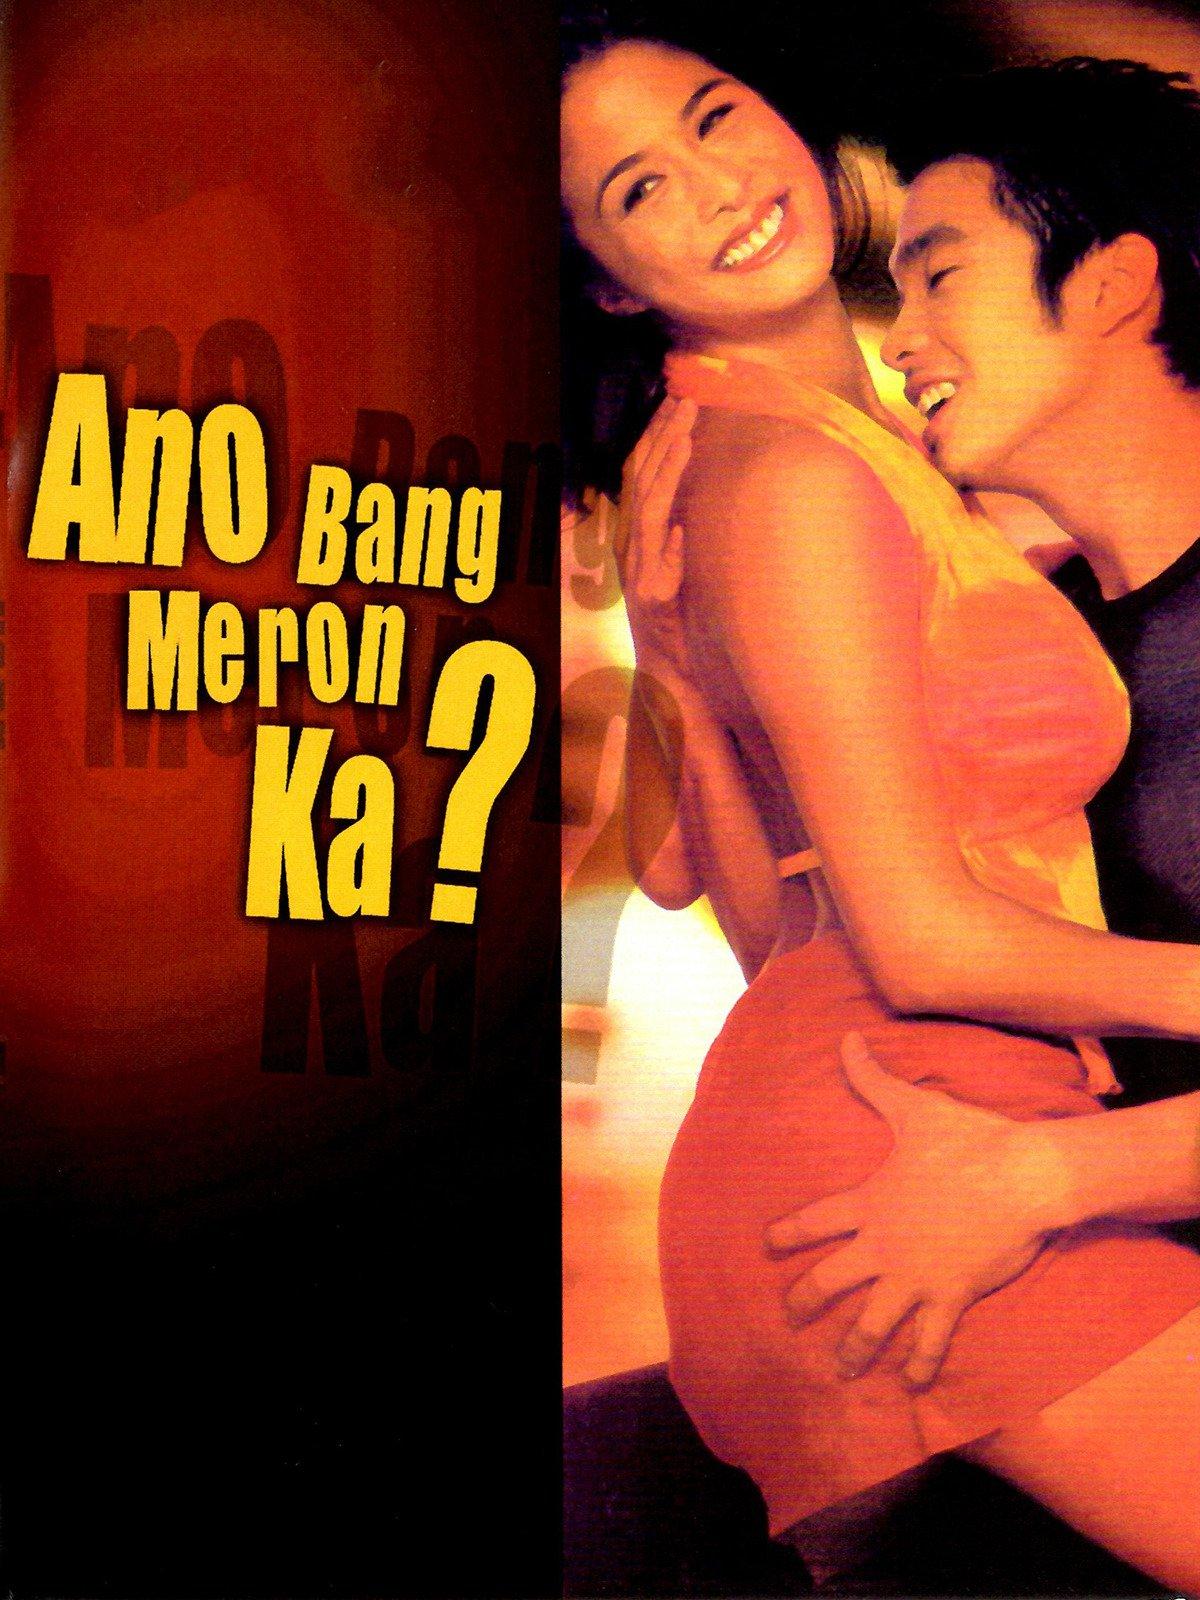 Ano Bang Meron Ka?